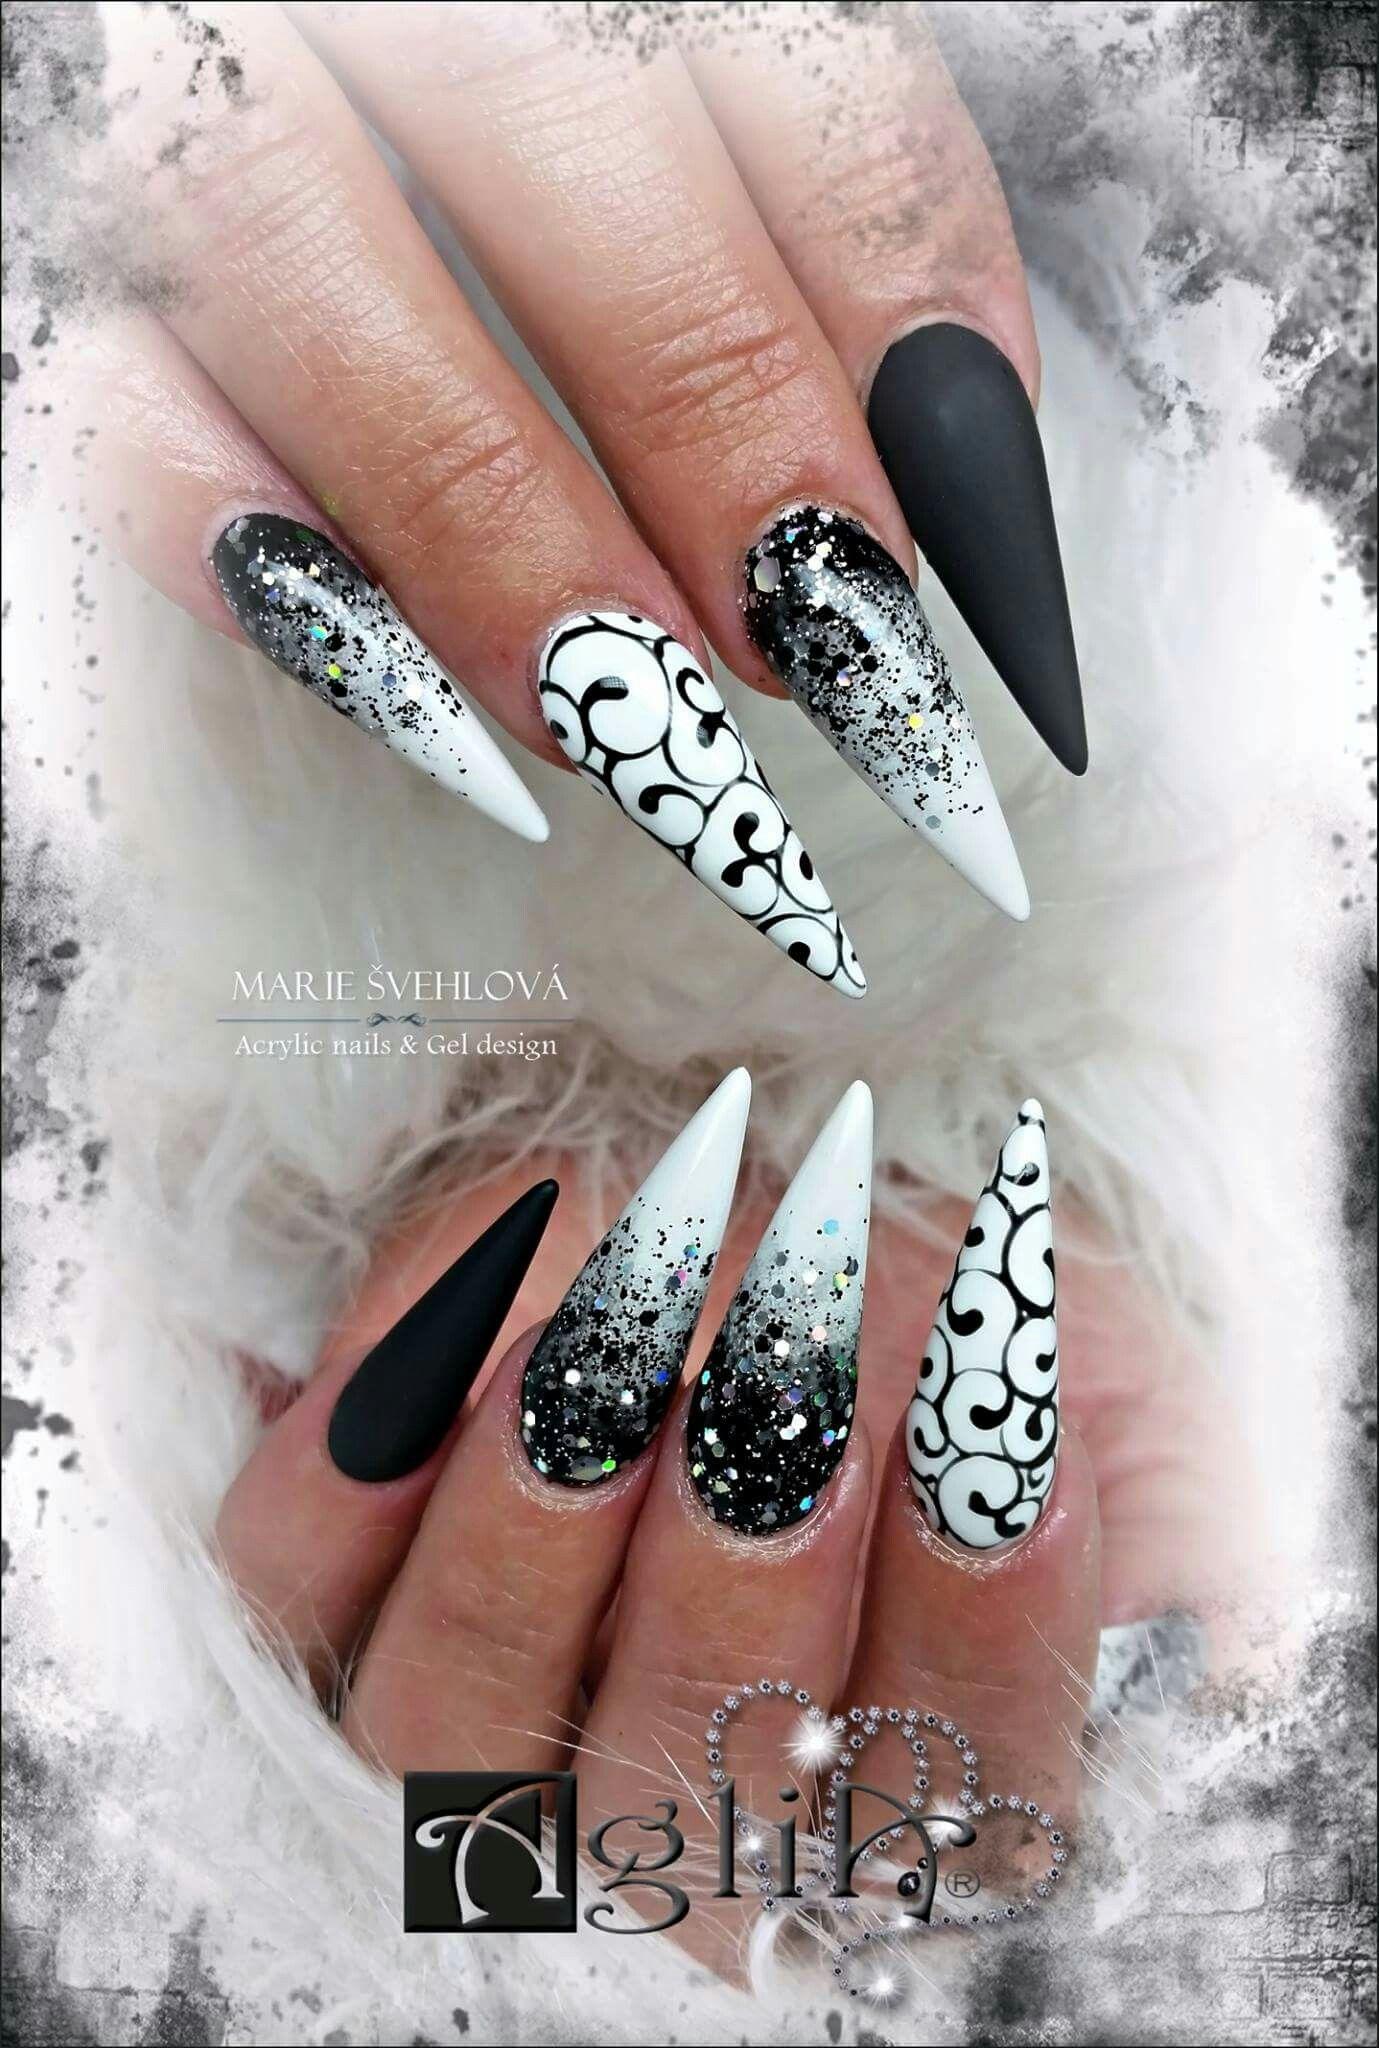 Acrylic Nails Gel Design Black White Nails Black Nail Designs White Nail Art White Nails